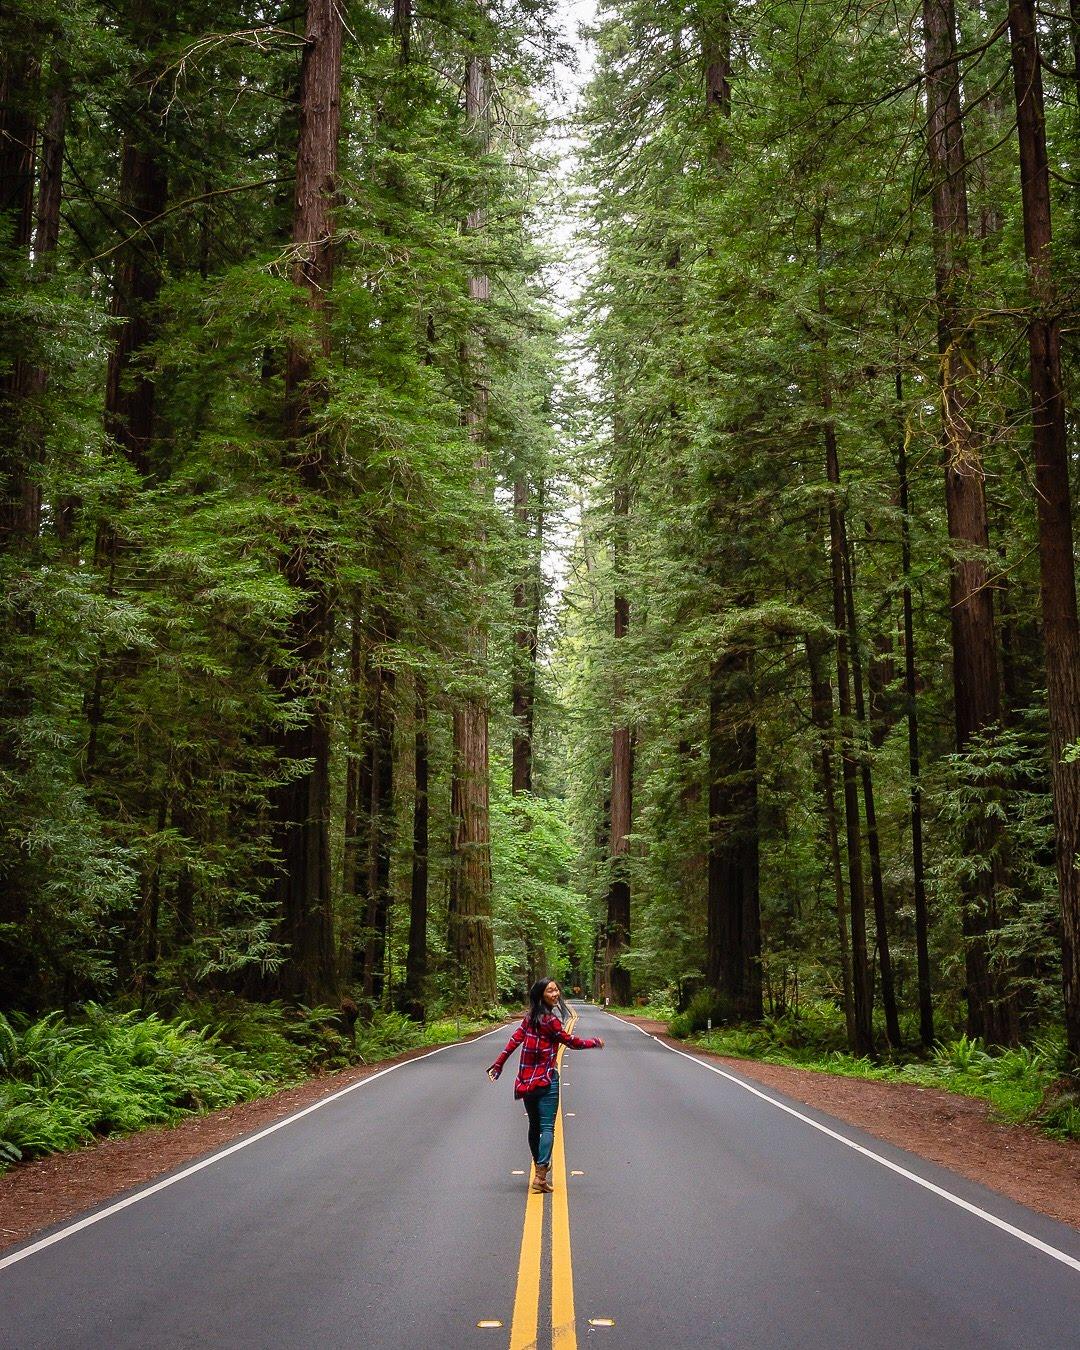 Avenue of Giants road